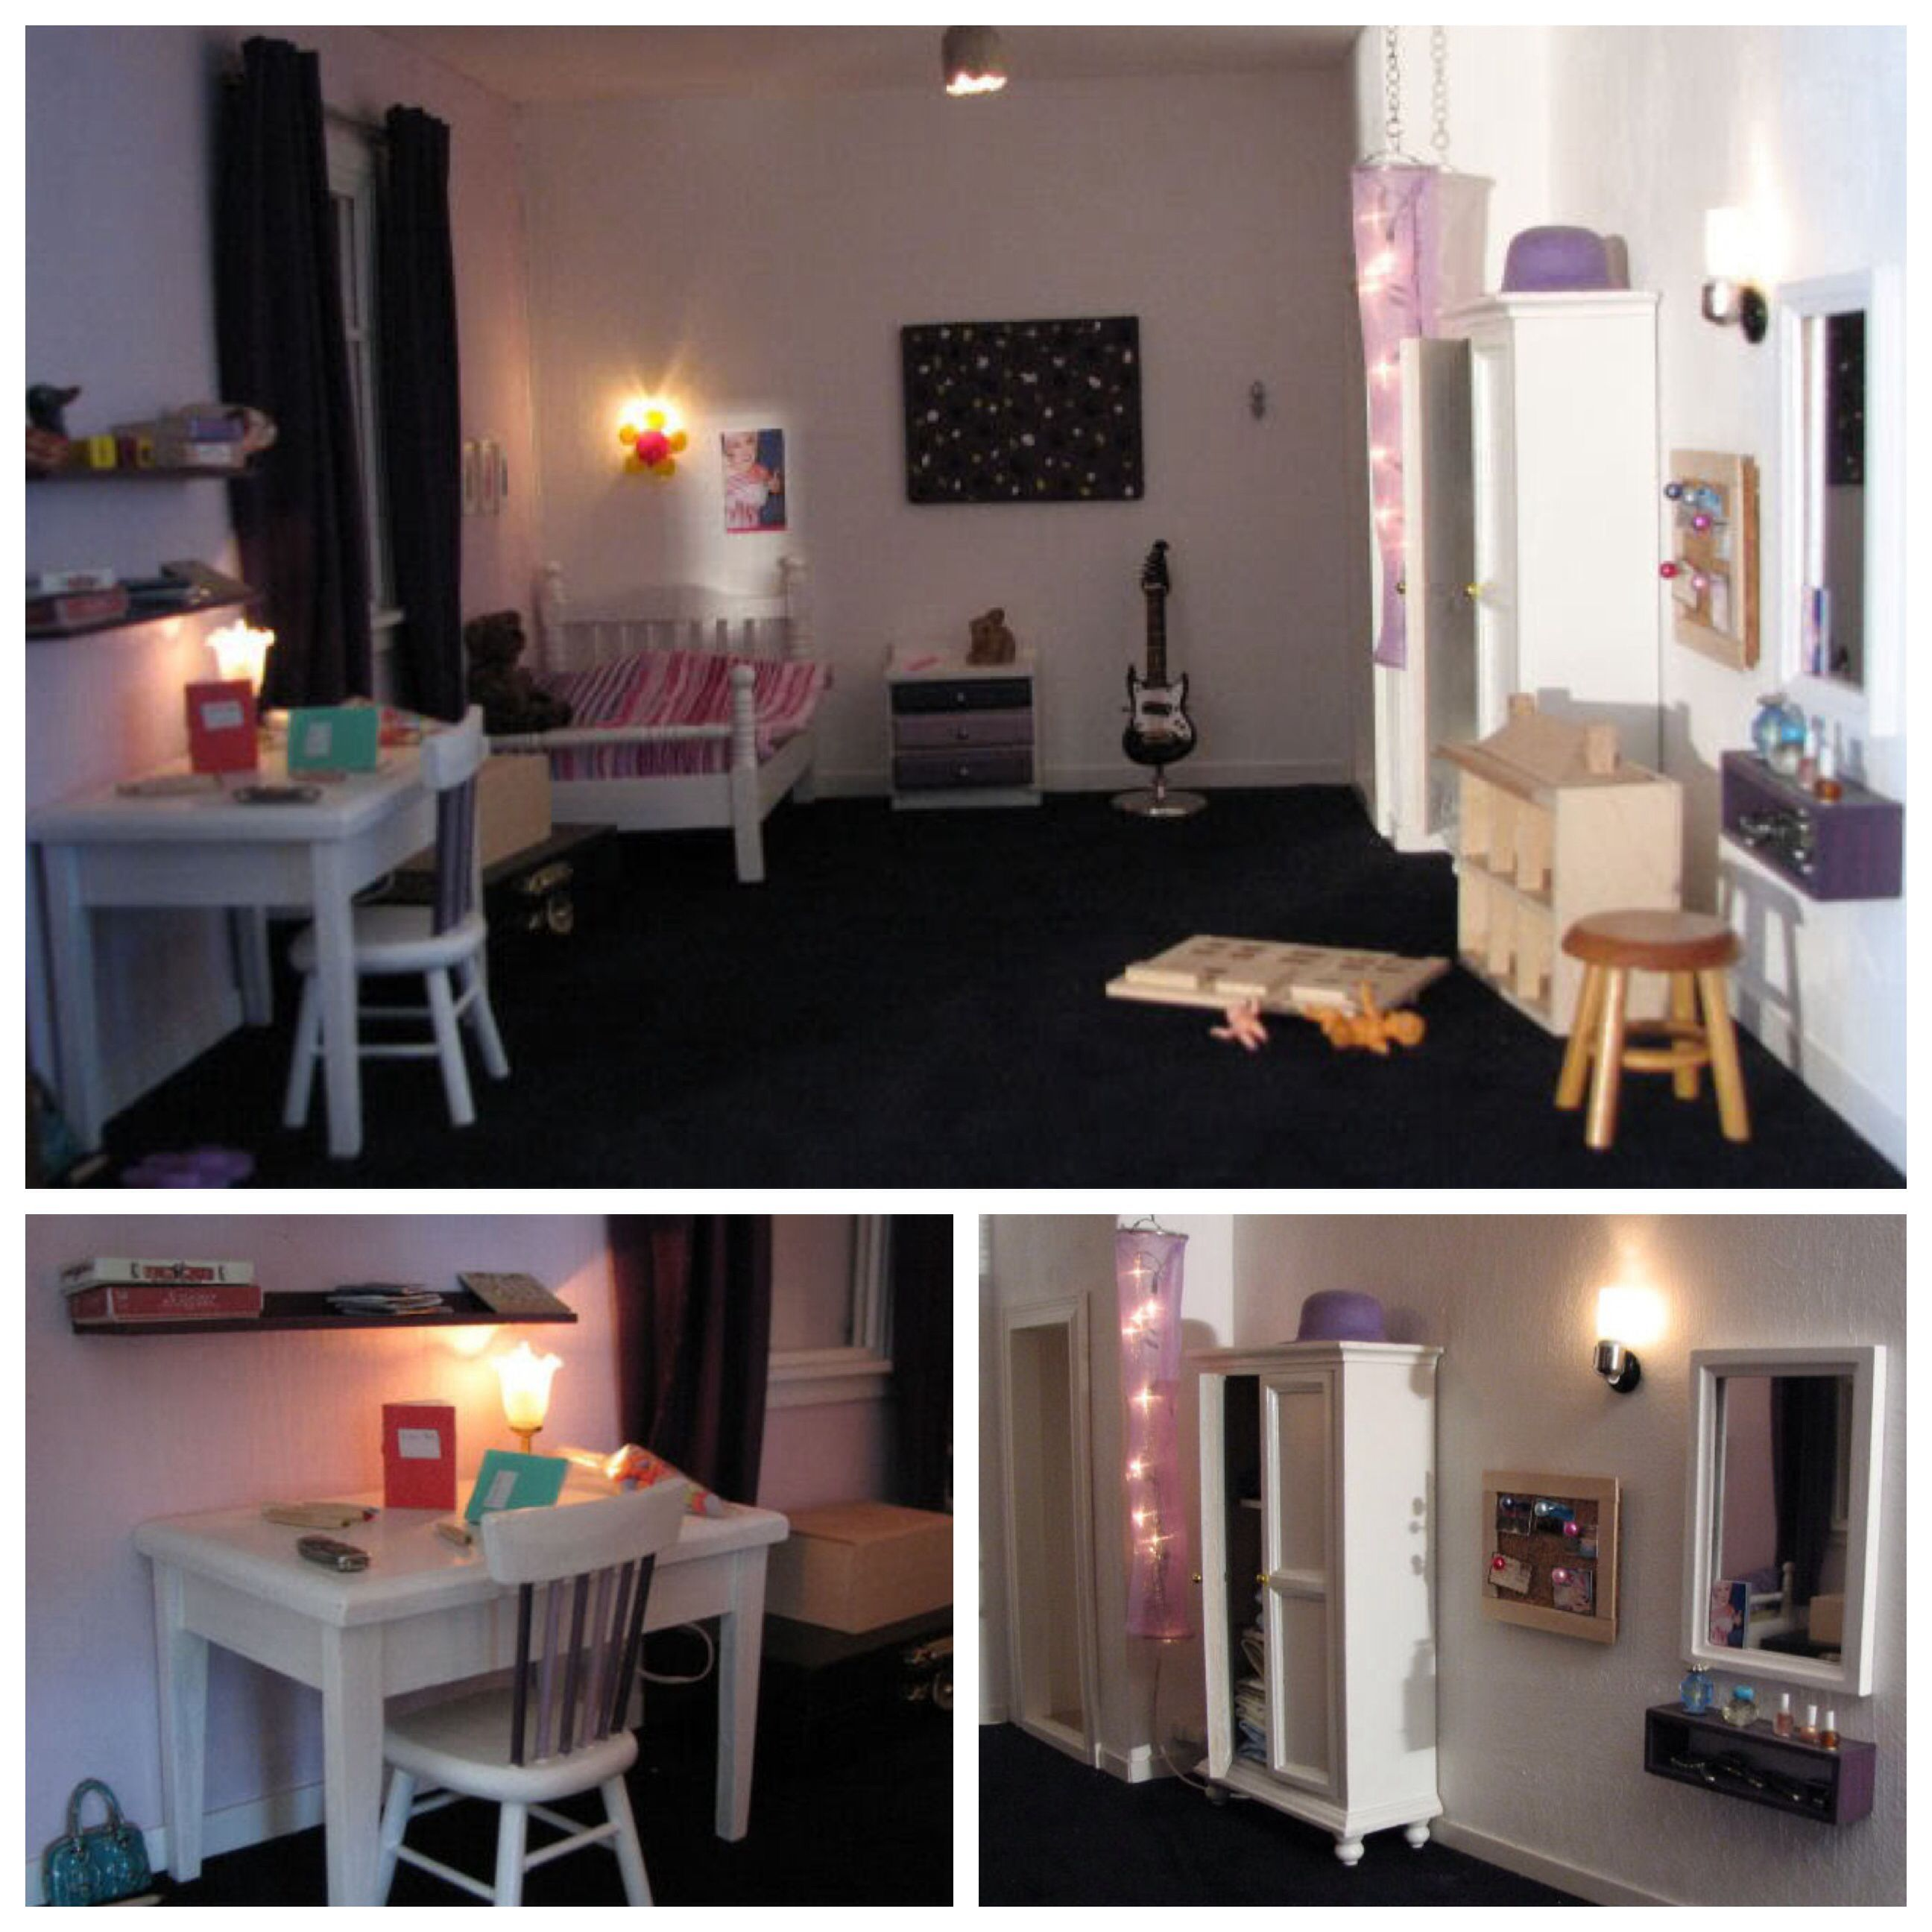 Kinderkamer poppenhuis, lampjes zijn zelfgemaakt. Emmy s dollhouse.